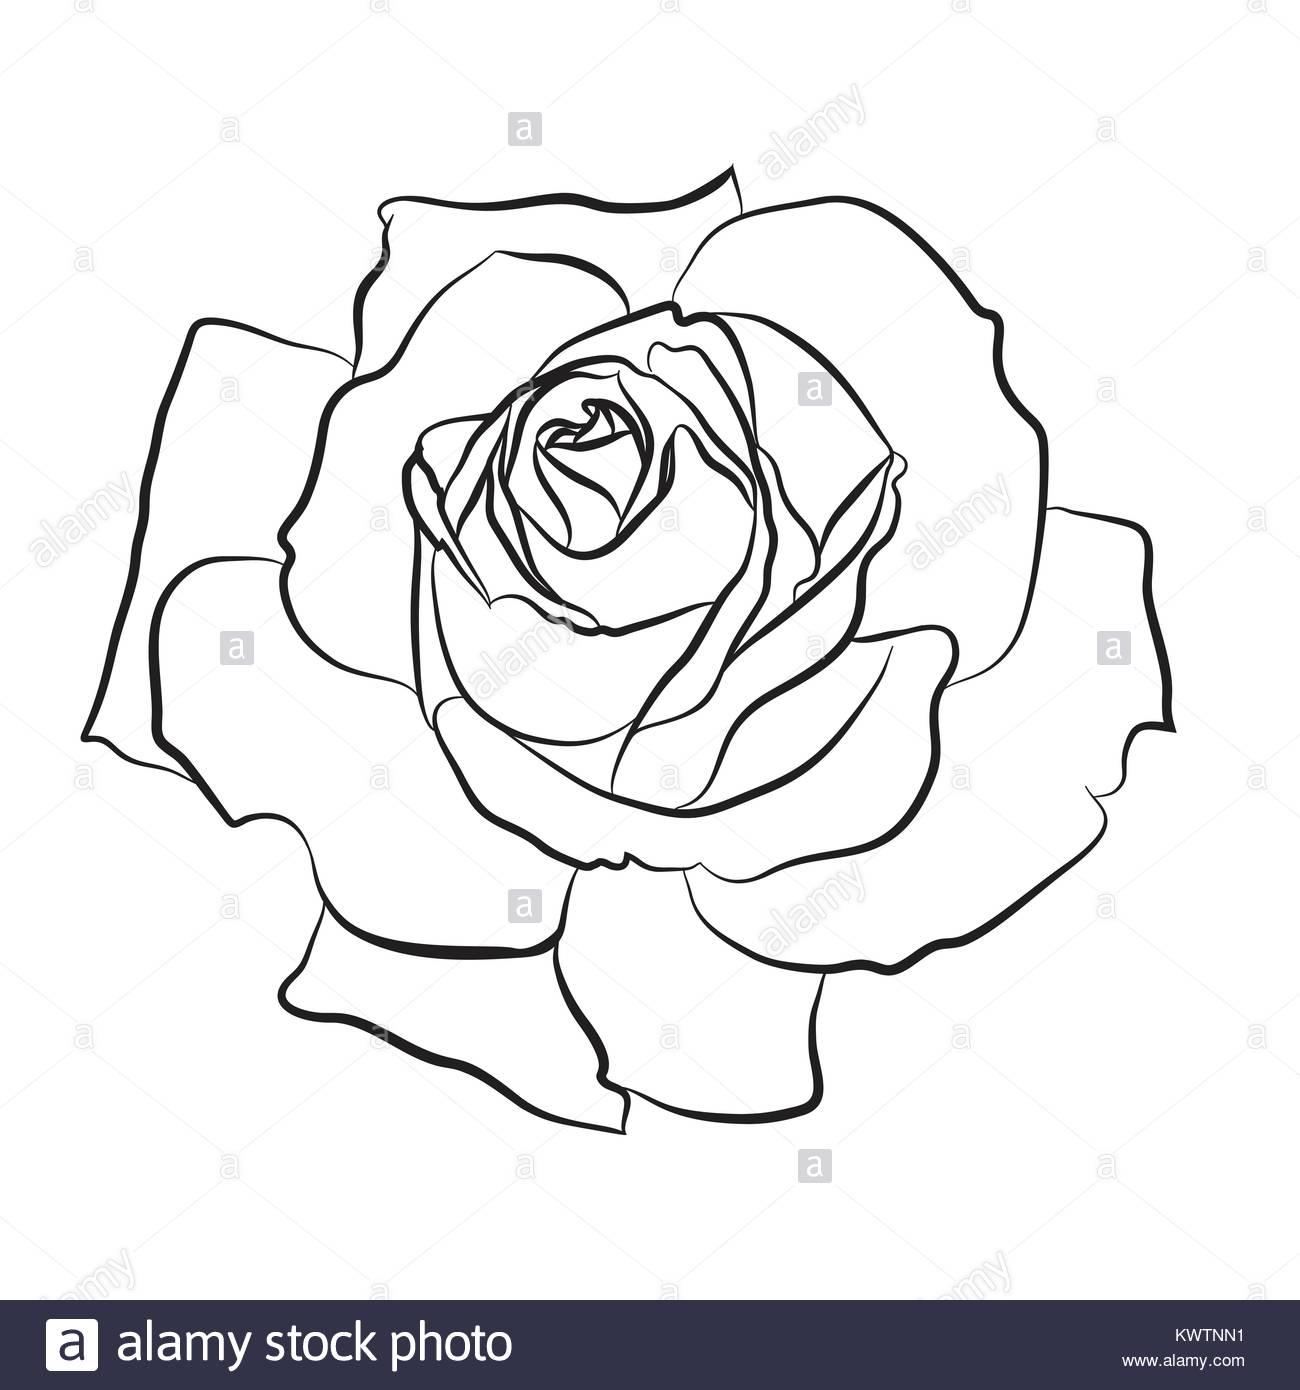 1300x1390 Single Flower Rose Bud Silhouette Stock Photos Amp Single Flower